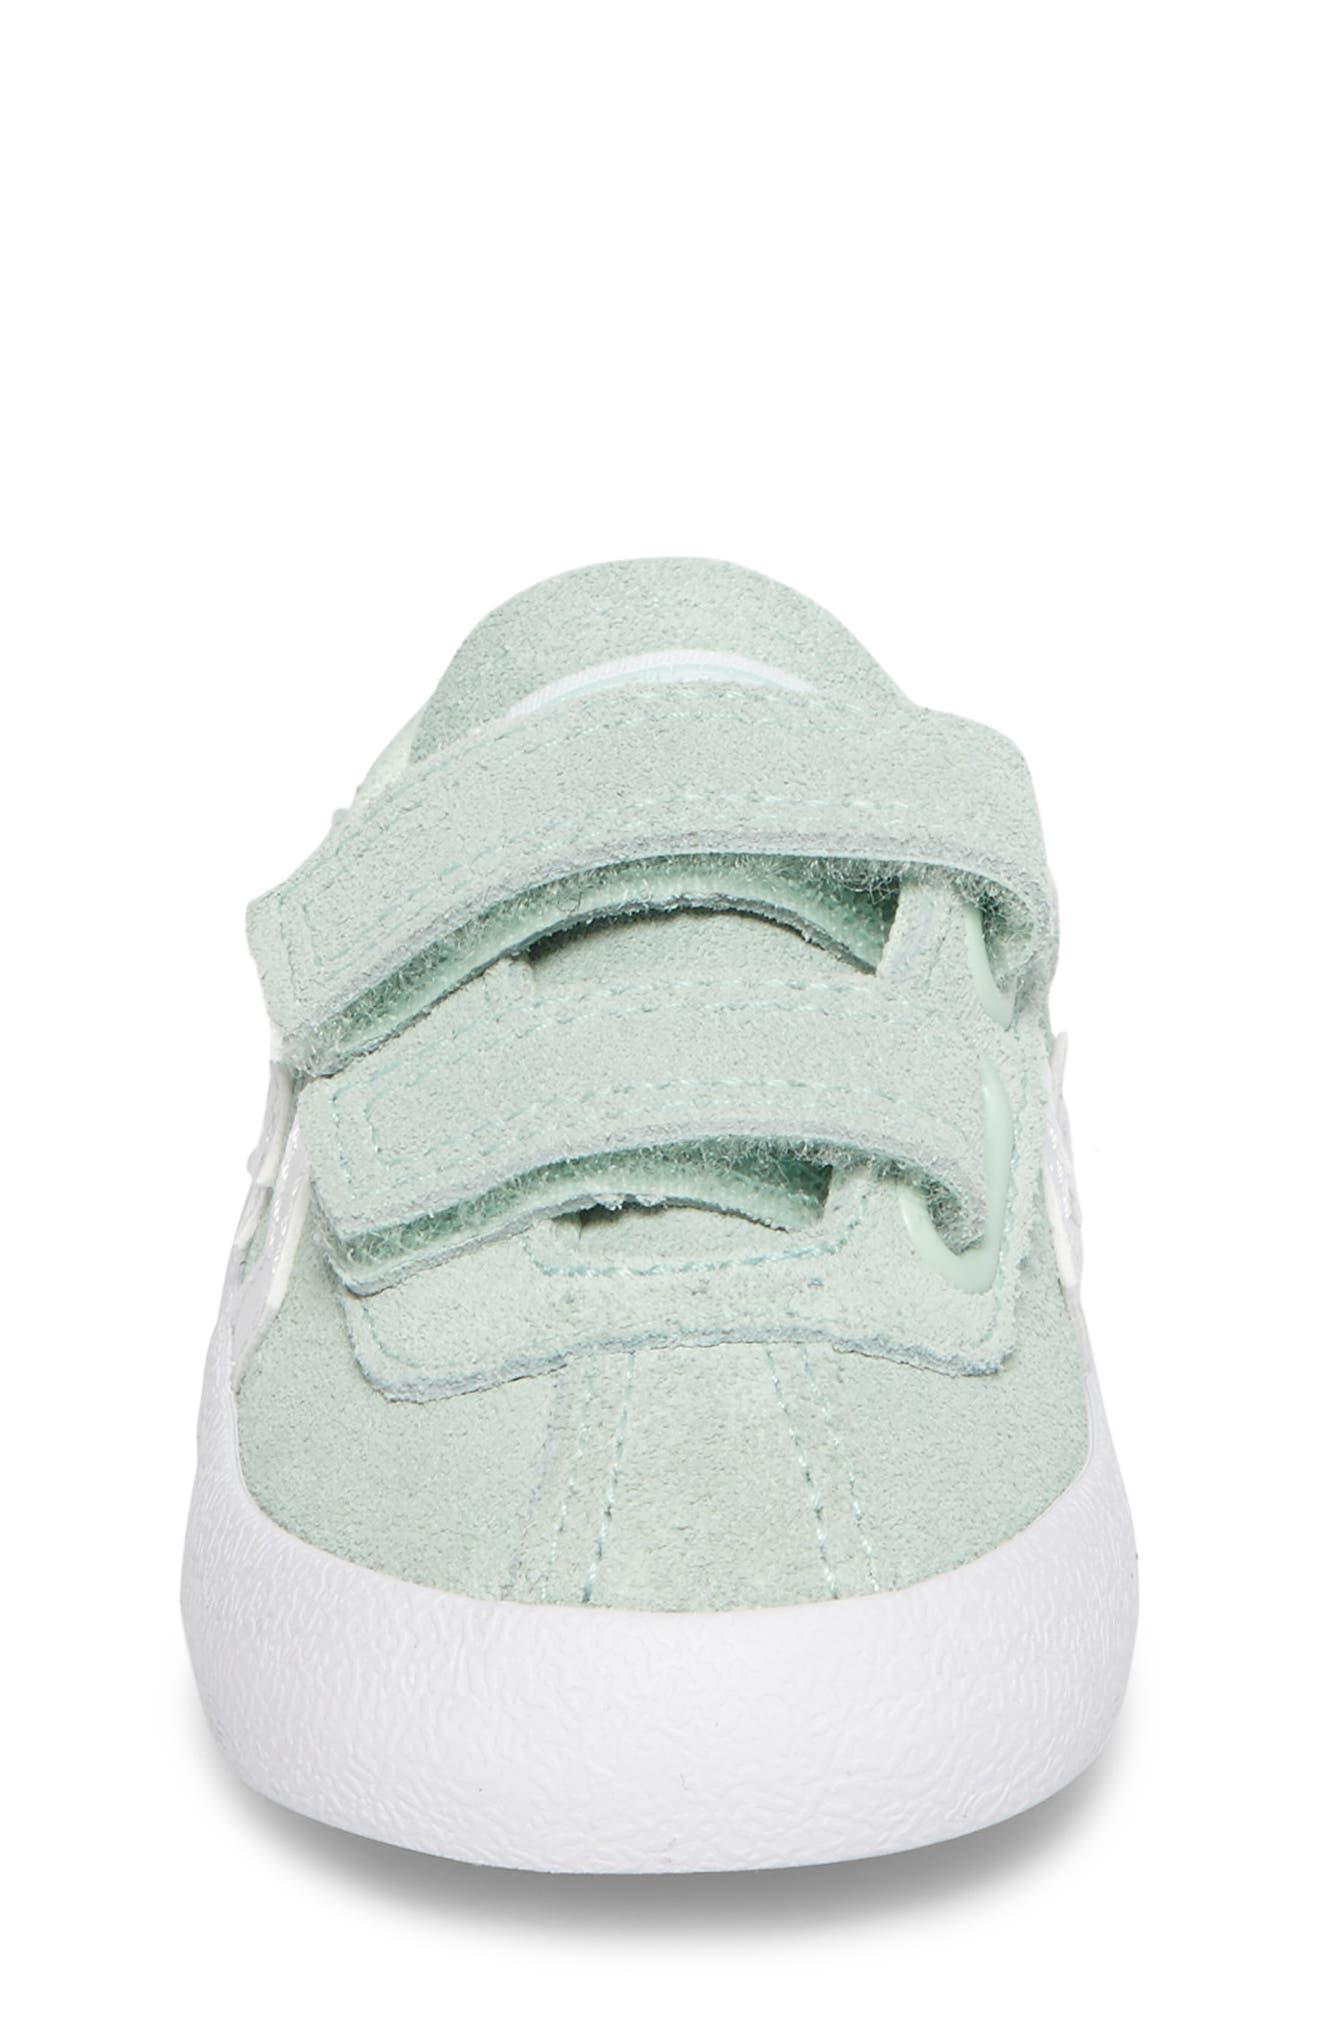 Breakpoint Sneaker,                             Alternate thumbnail 4, color,                             300